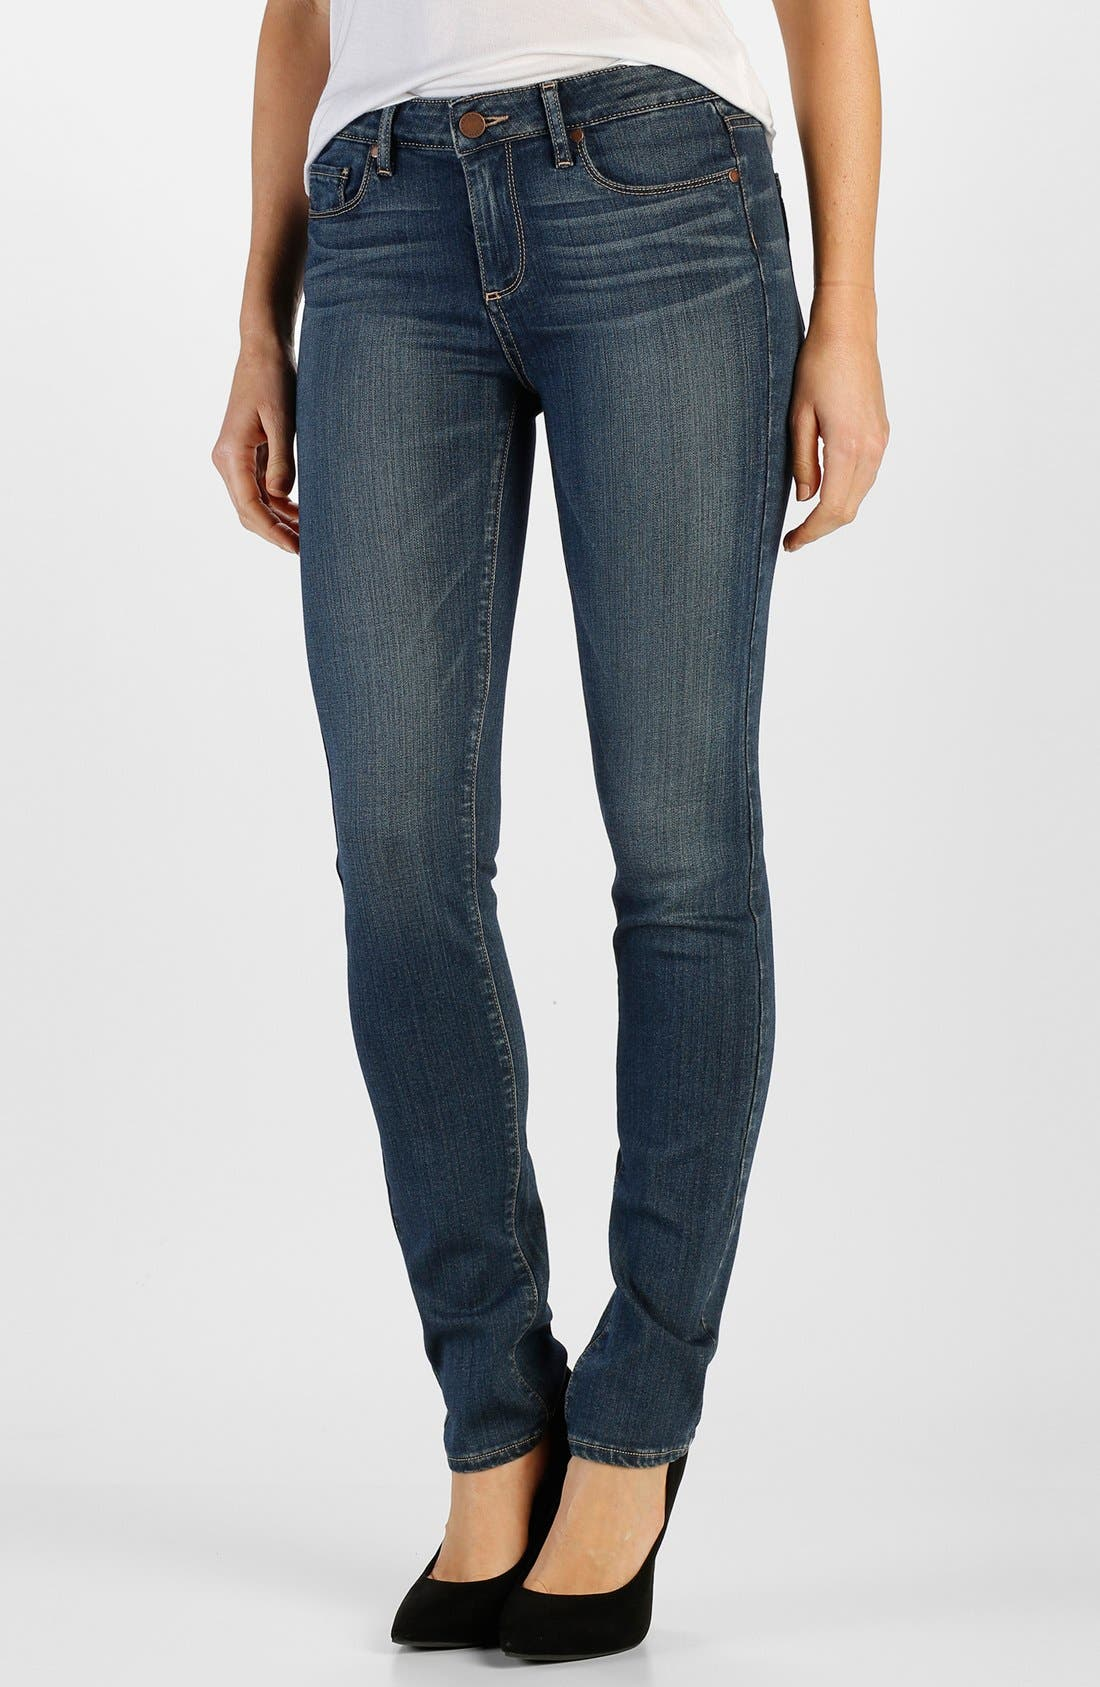 Alternate Image 1 Selected - Paige Denim 'Transcend - Skyline' Skinny Jeans (Lex)